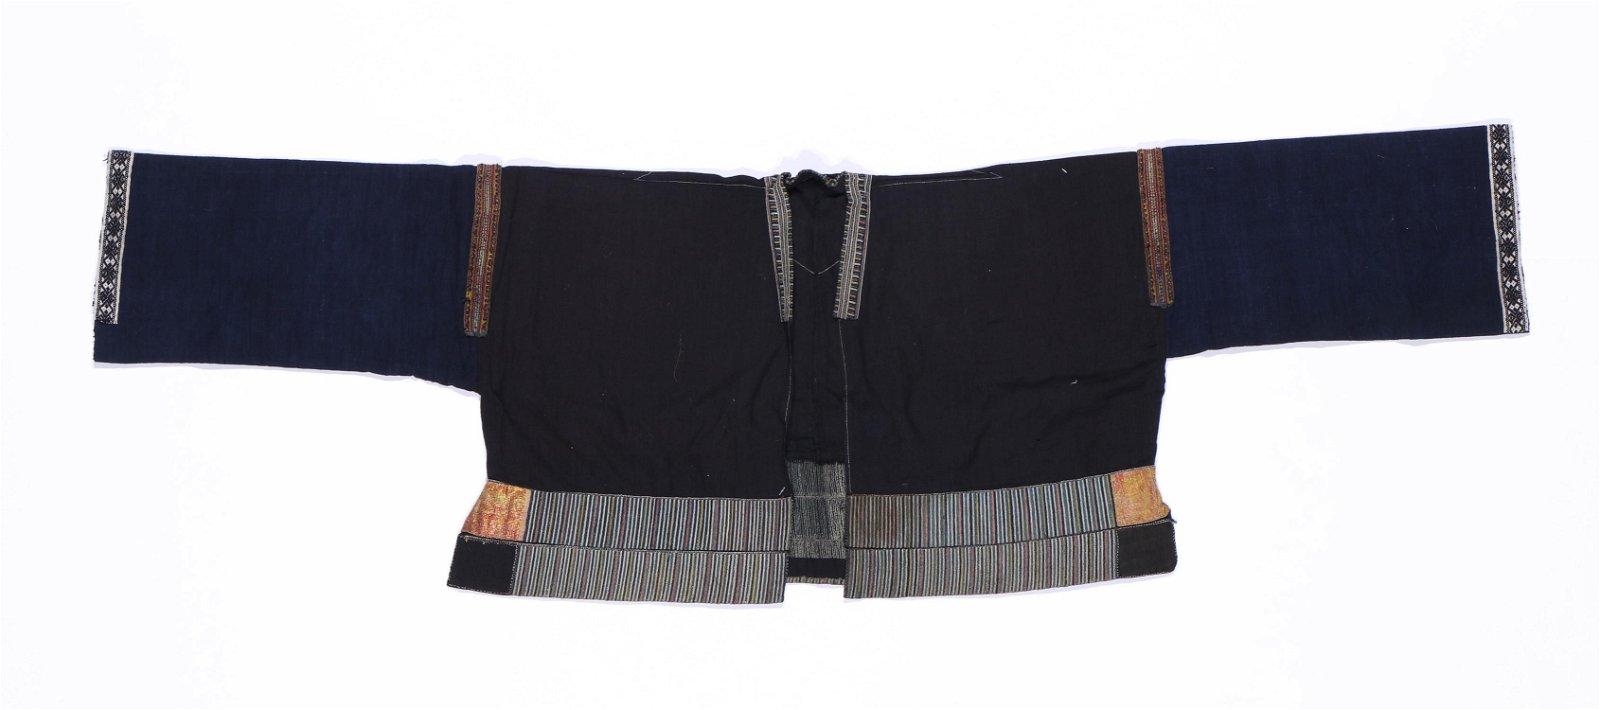 Danzai Miao Cotton Jacket with Silk Embroidery